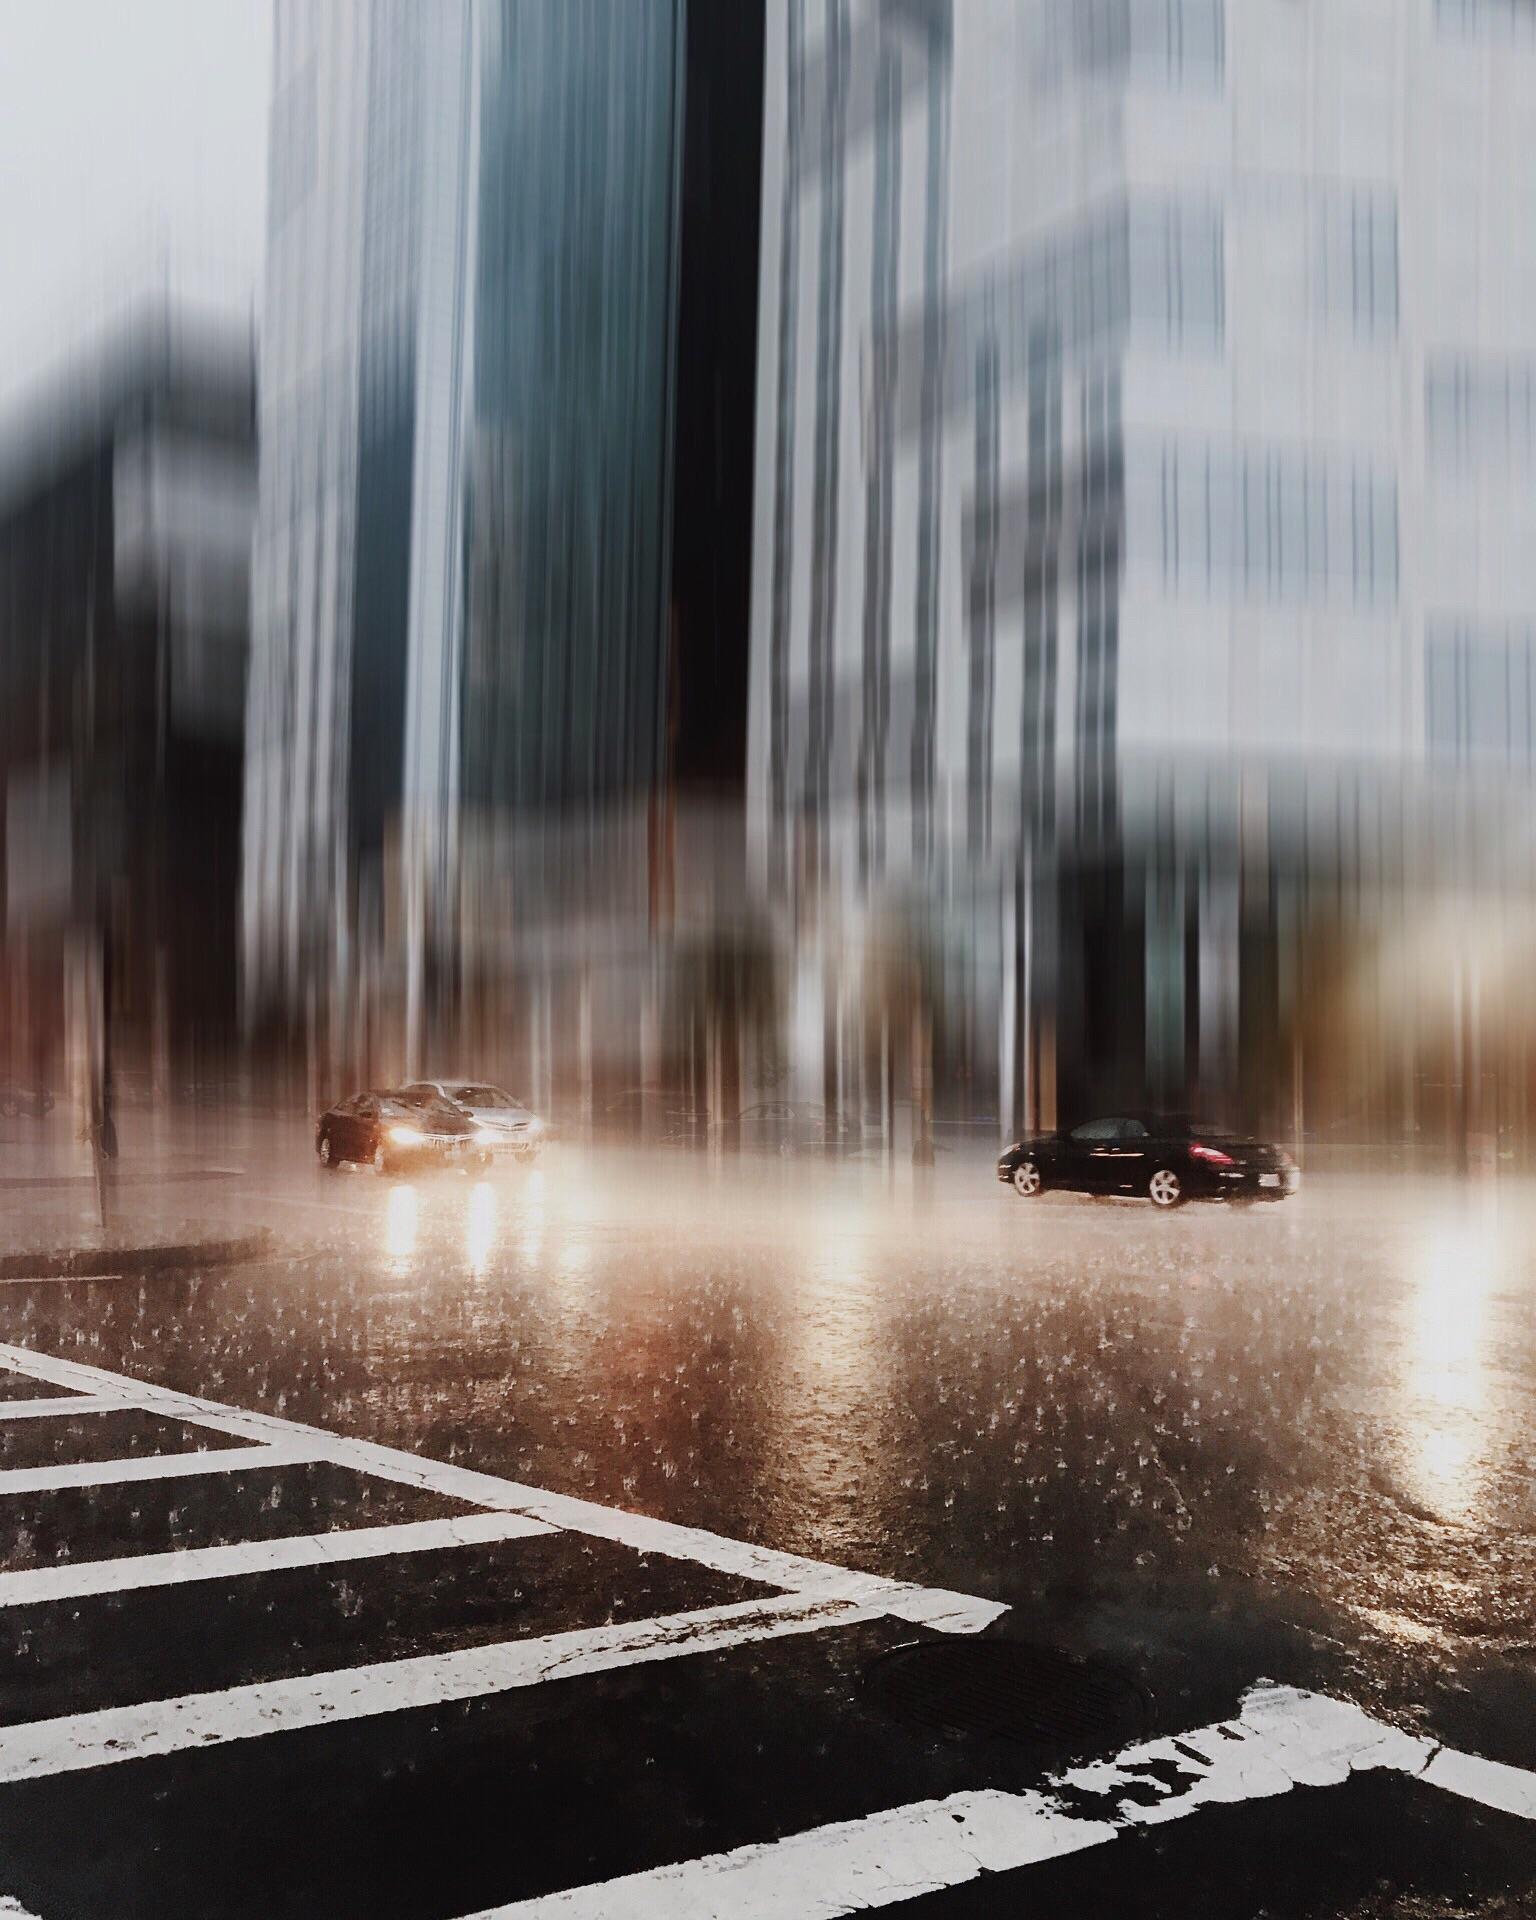 @burnashburn - Financial District, Boston, MA